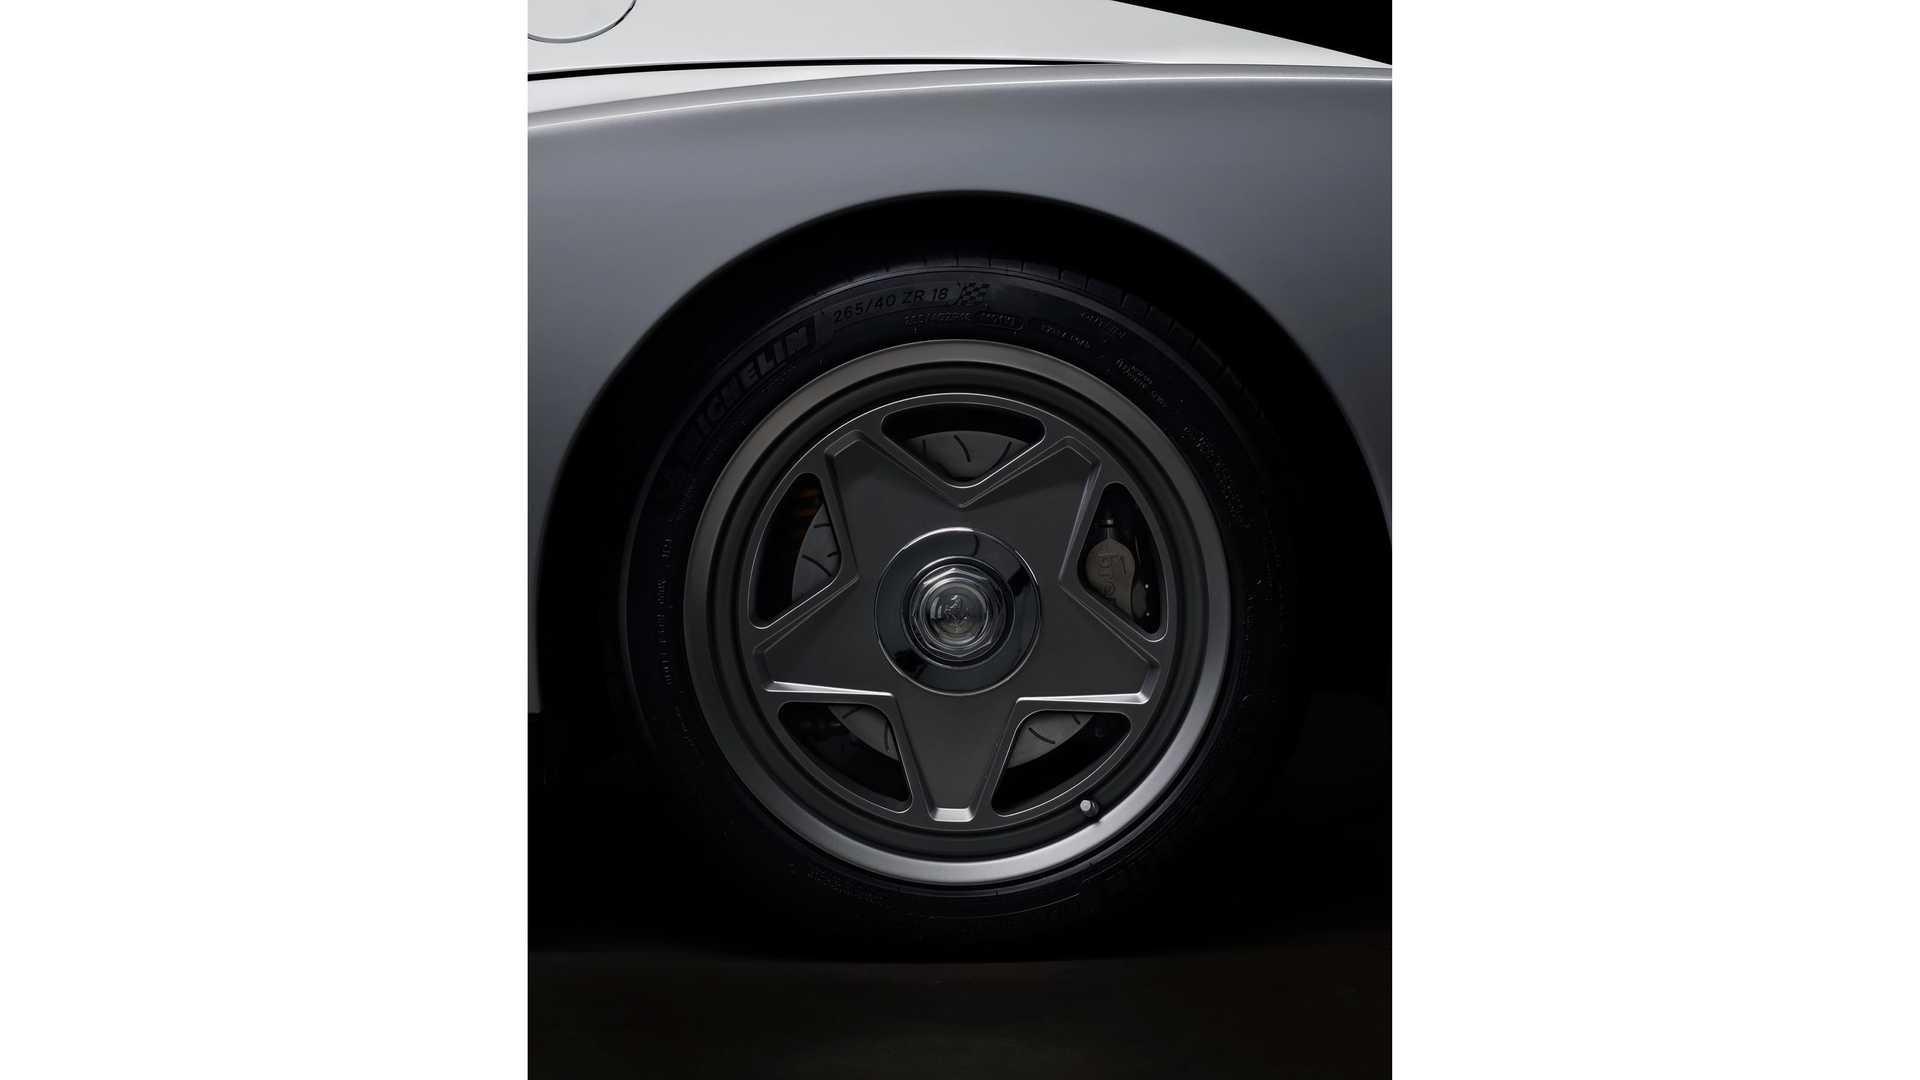 Ferrari-Testarossa-restomod-Officine-Fioravanti-11